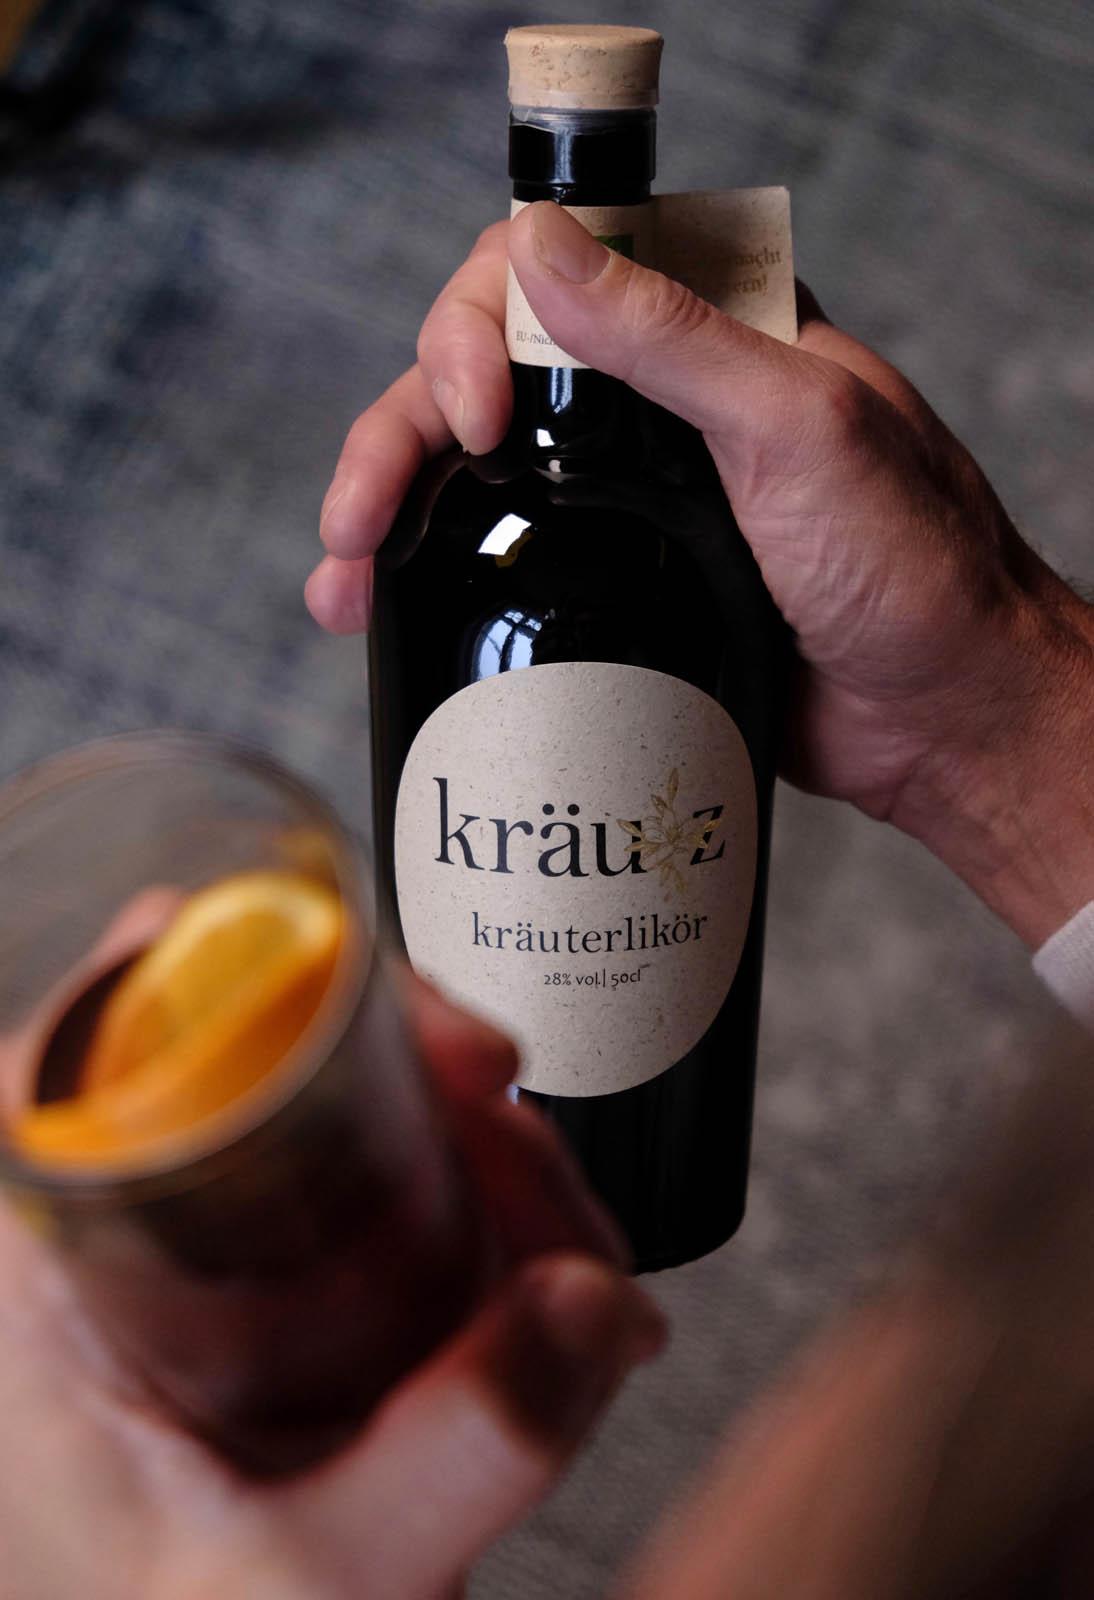 Kraeutz Kraeuterlikoer Flasche